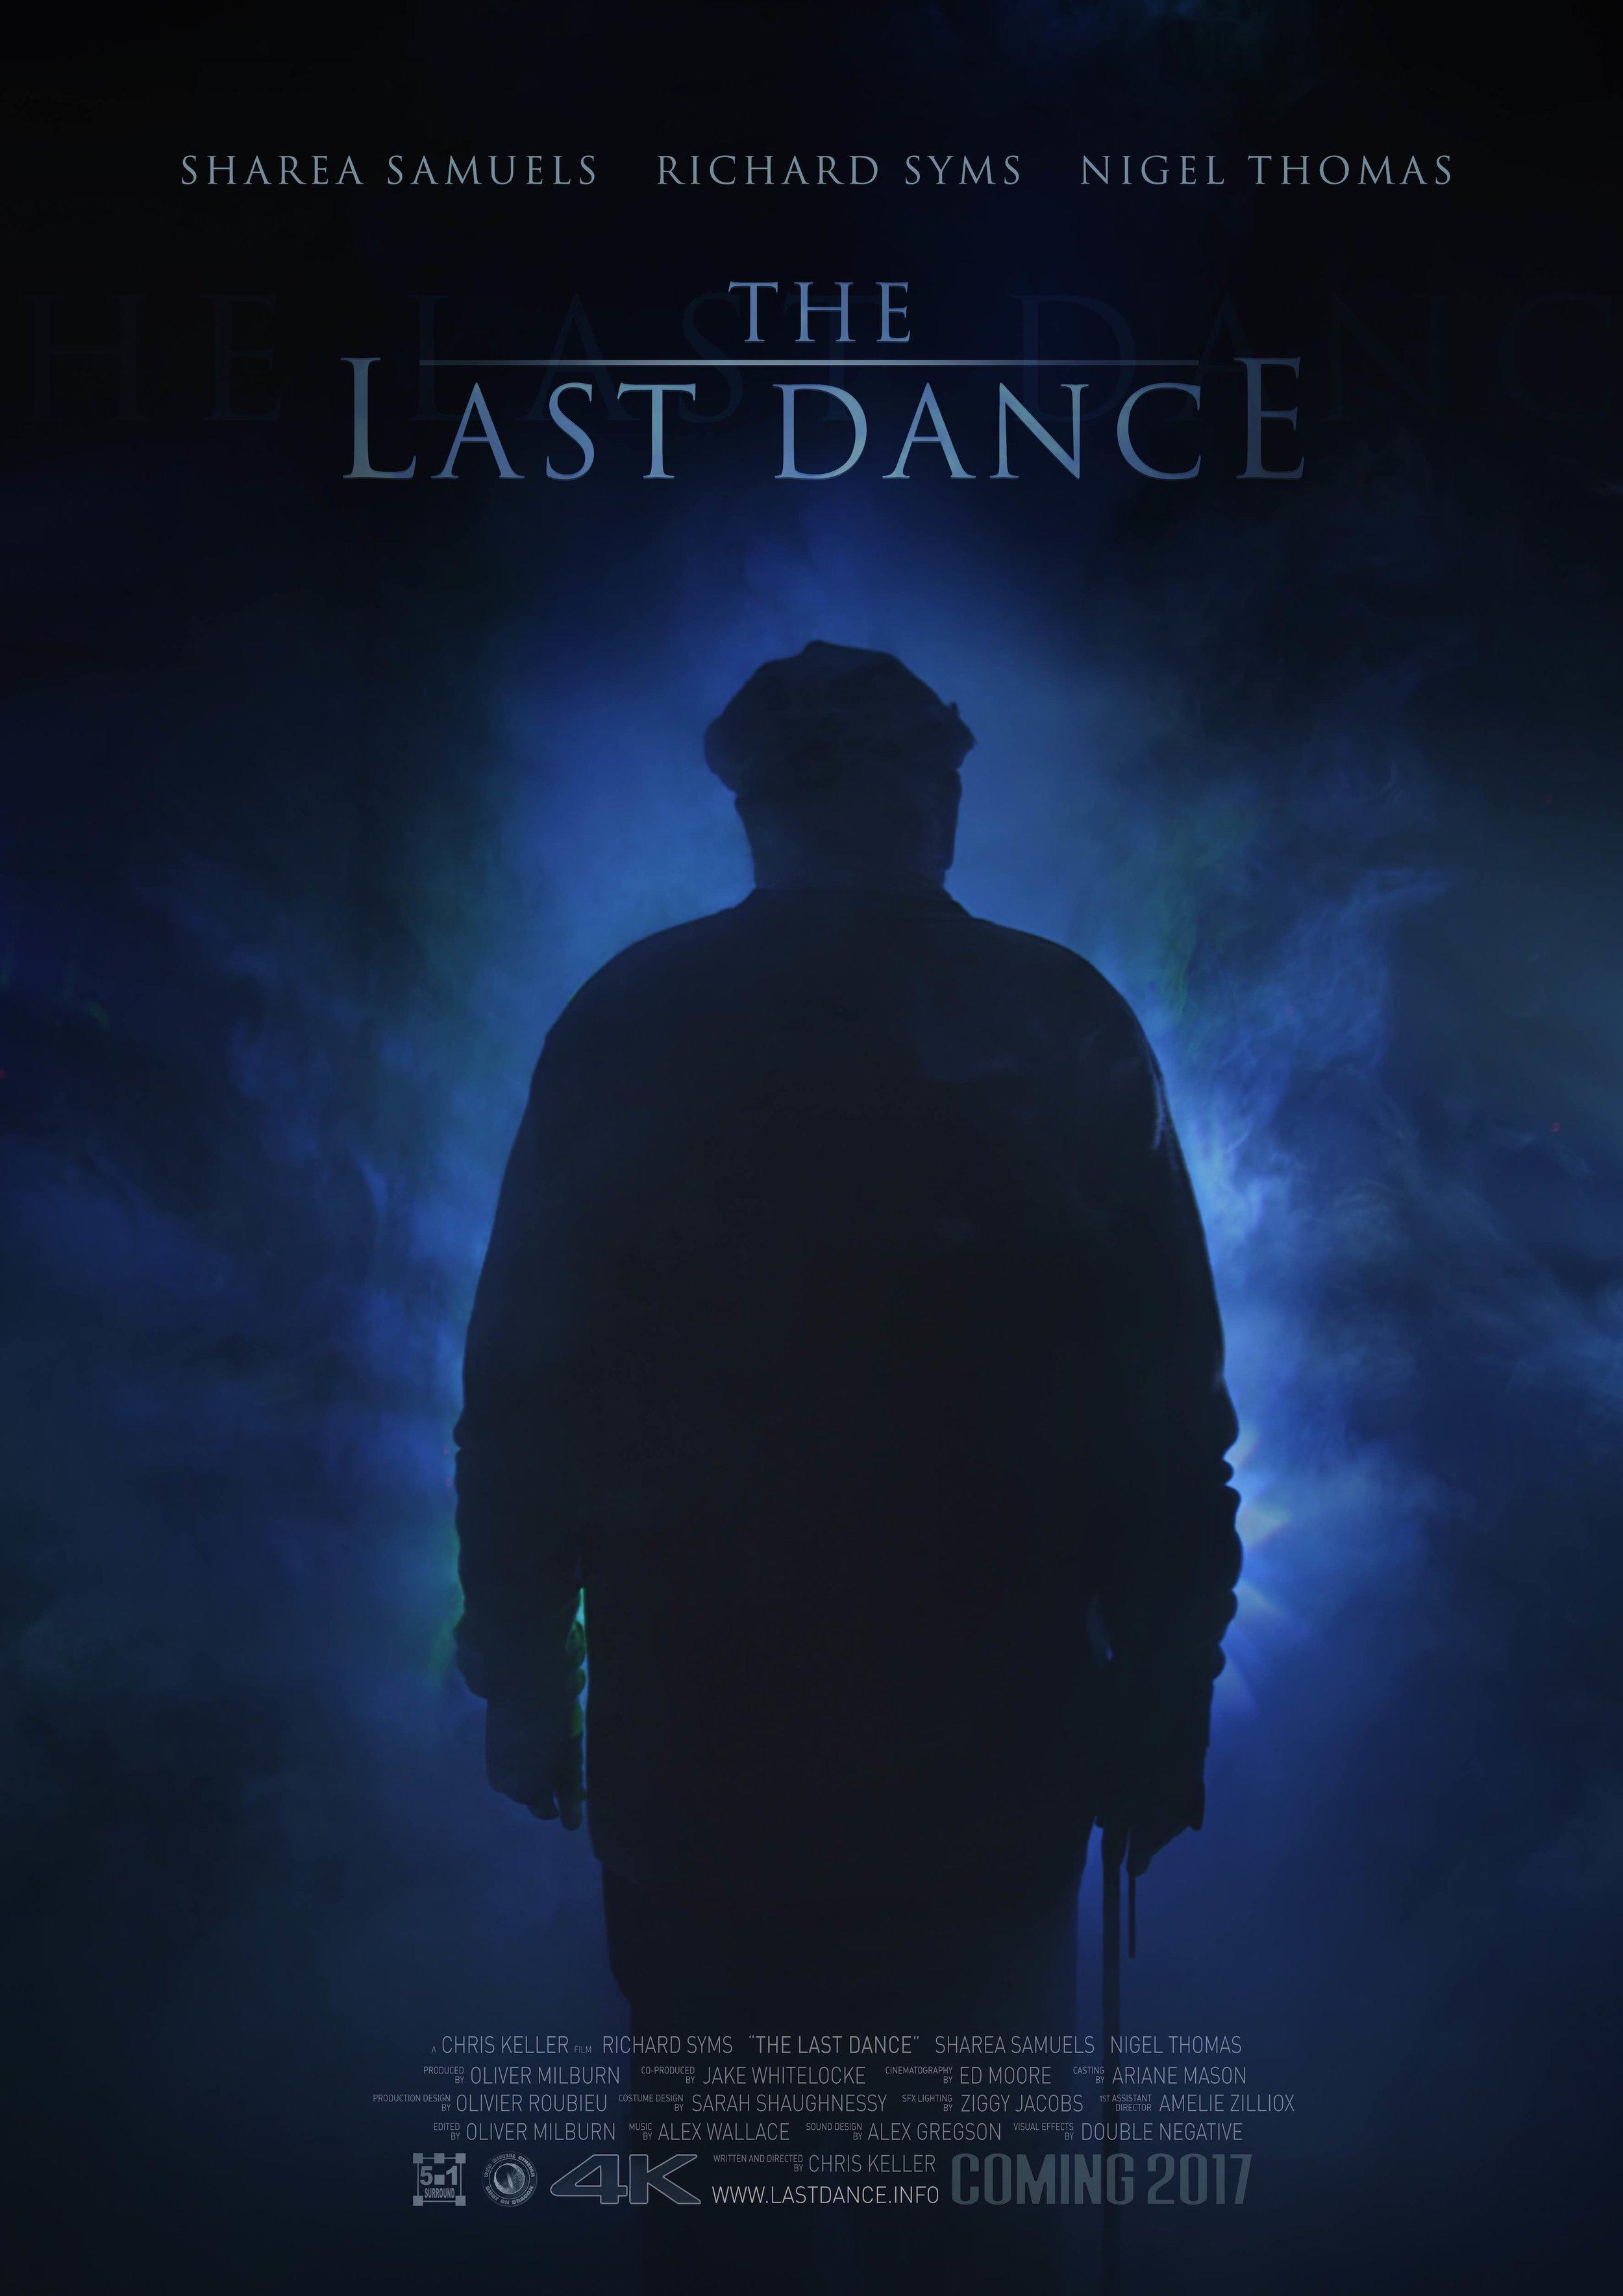 The Last Dance — Chris Keller - Director